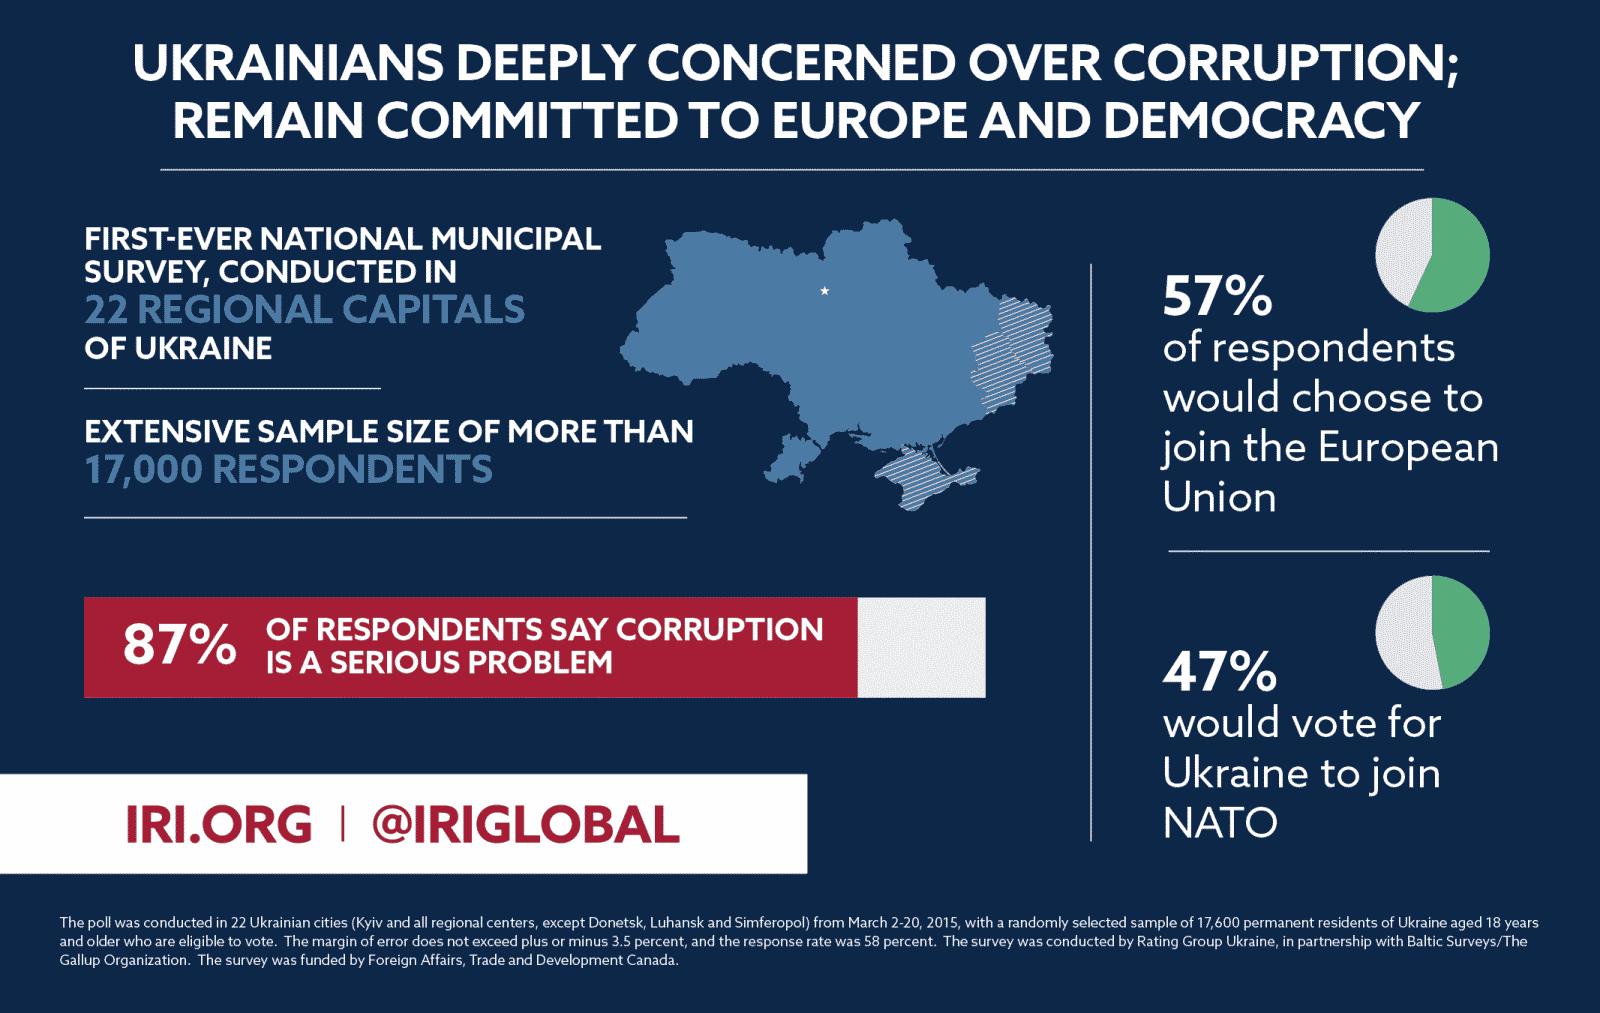 2015-05-19_first-ever_iri_ukraine_national_municipal_poll uaposition